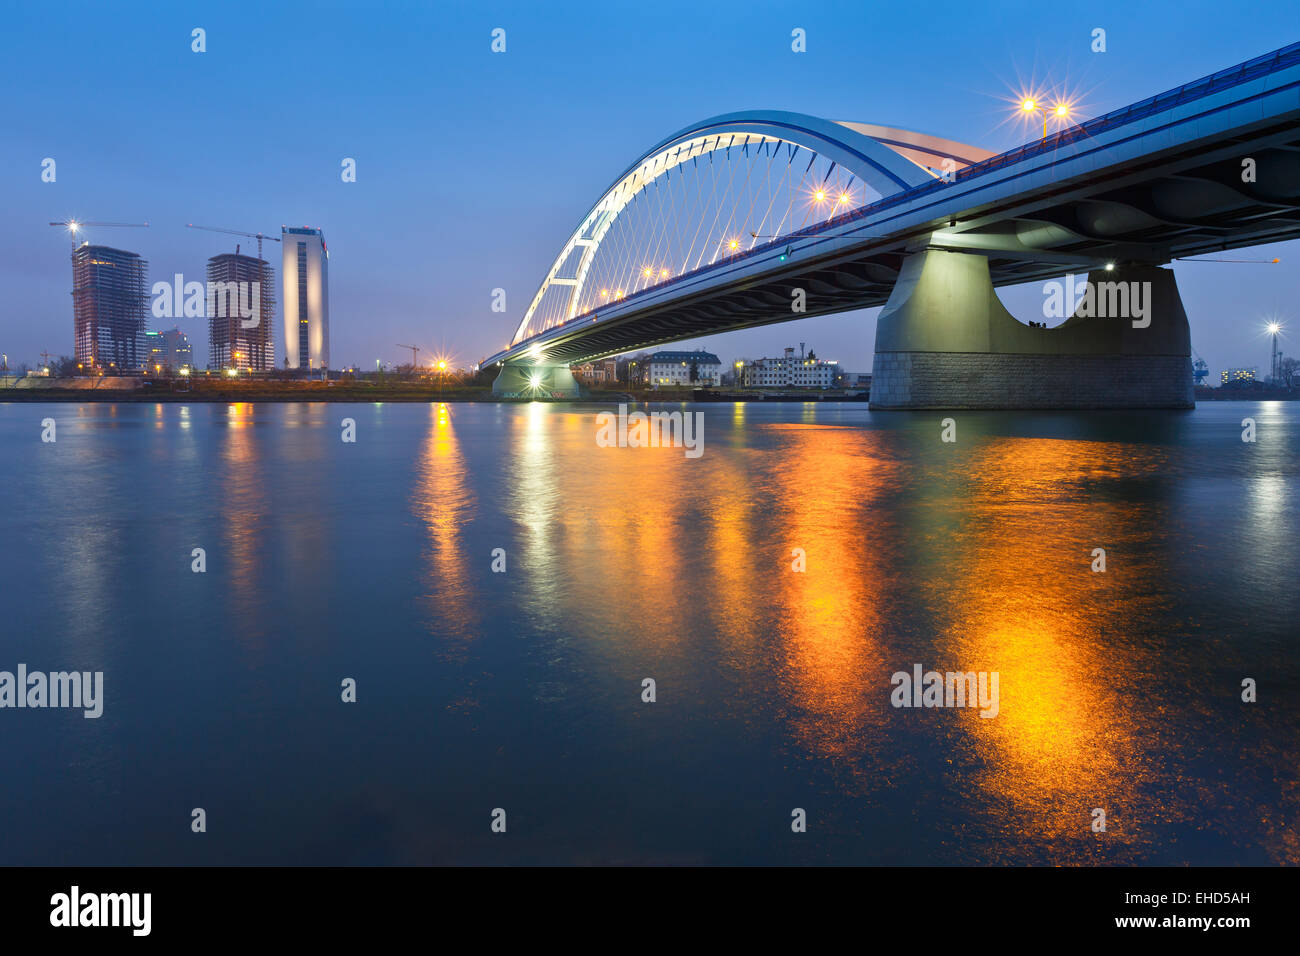 Apollo bridge and highrise buildings in Bratislava, Slovakia. - Stock Image